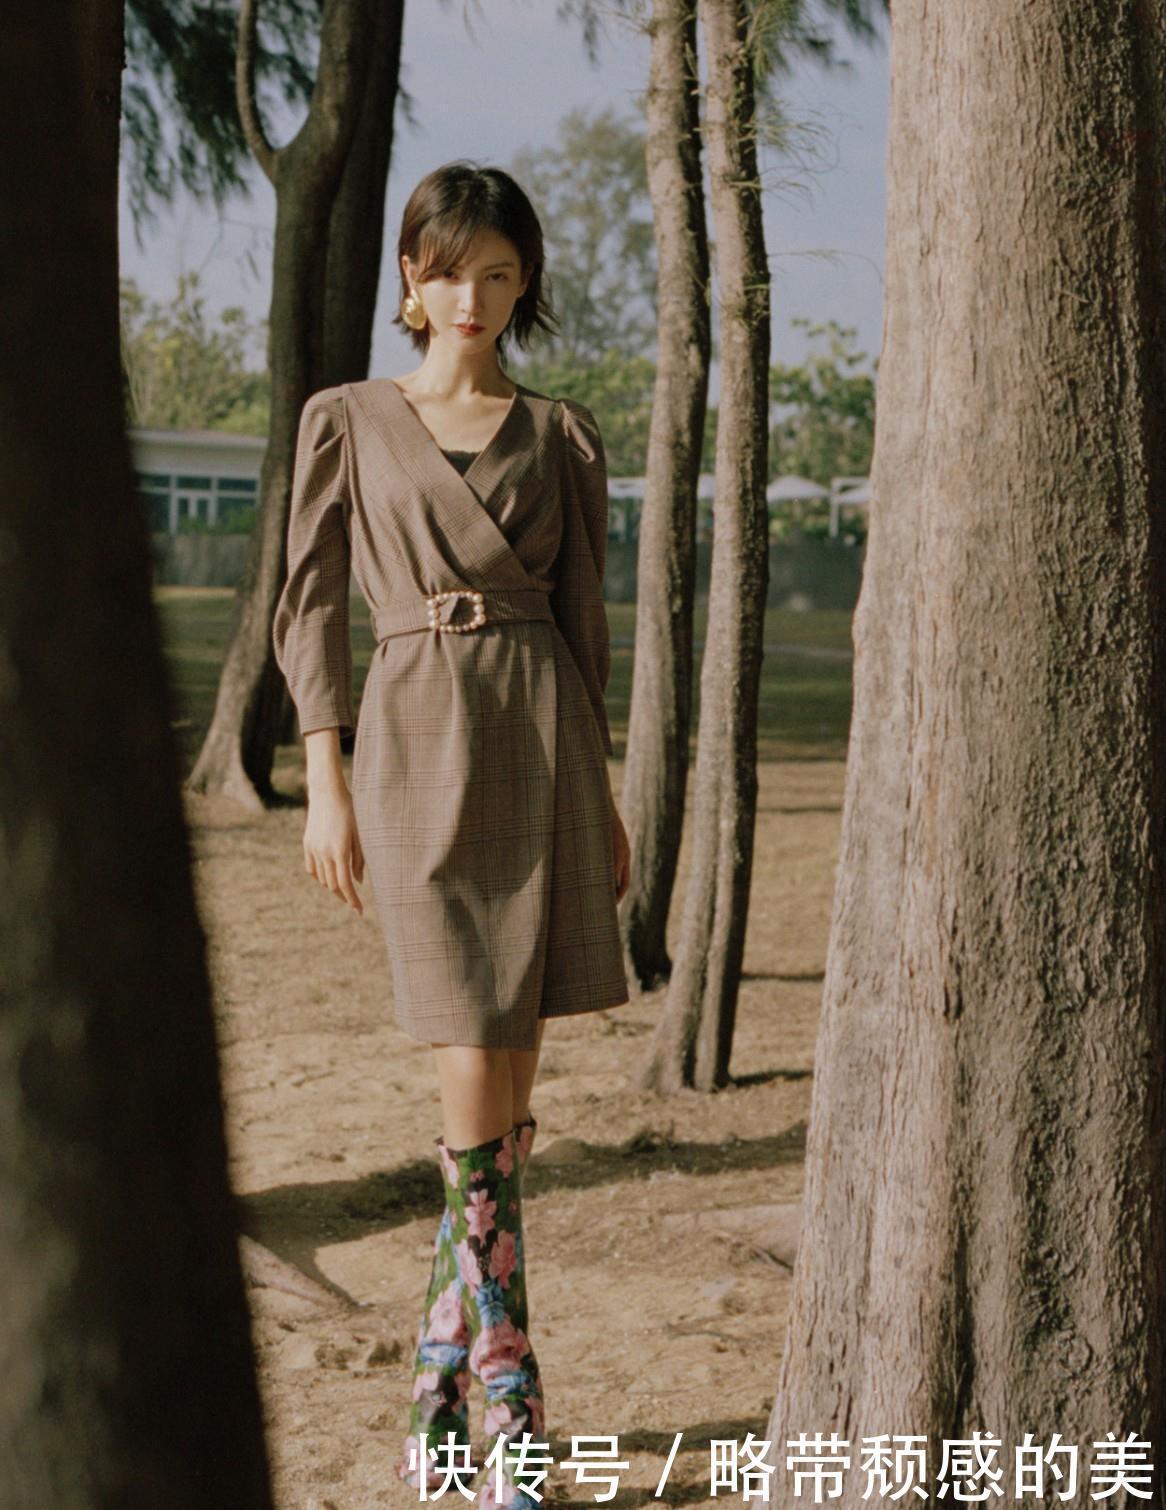 <b>金晨写真照曝光,穿格纹收腰裙知性大气,看到鞋网友笑了:太抢镜</b>